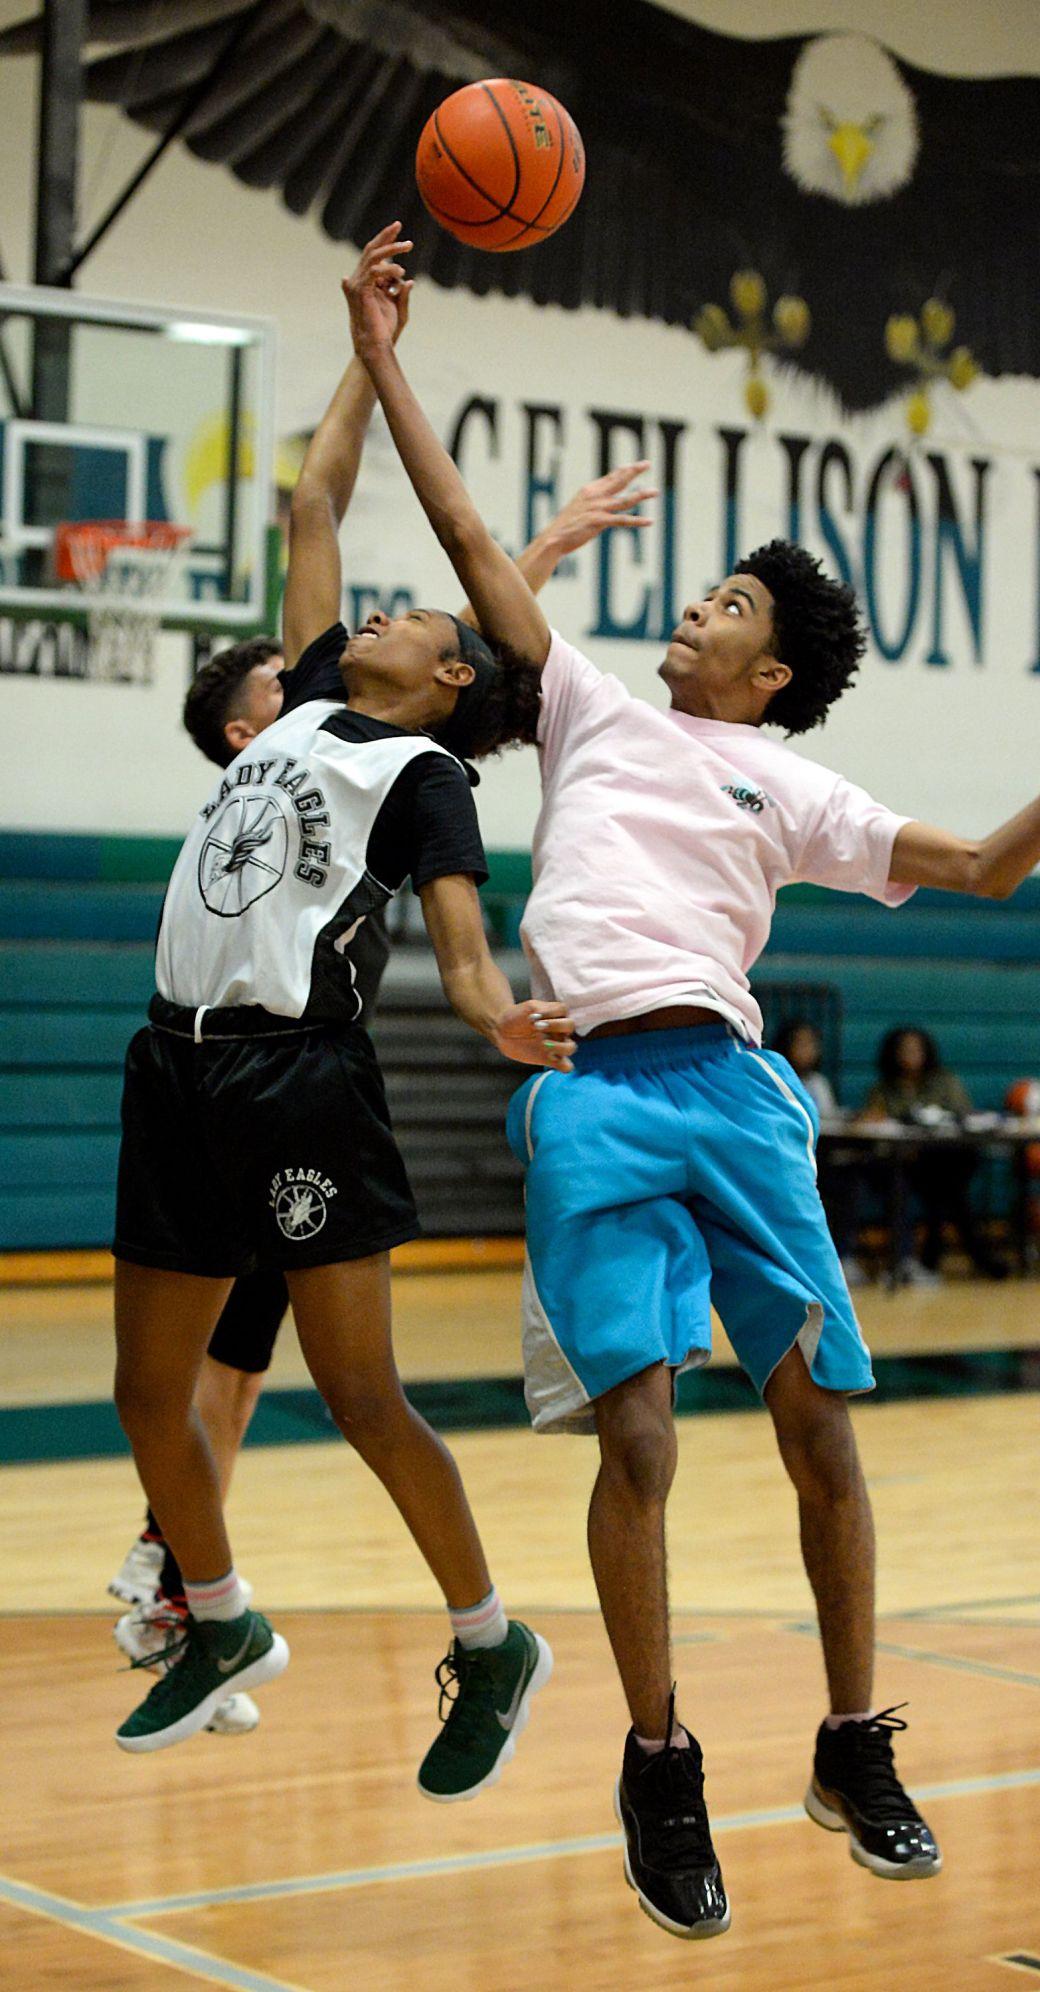 Ellison Girls Basketball Practice